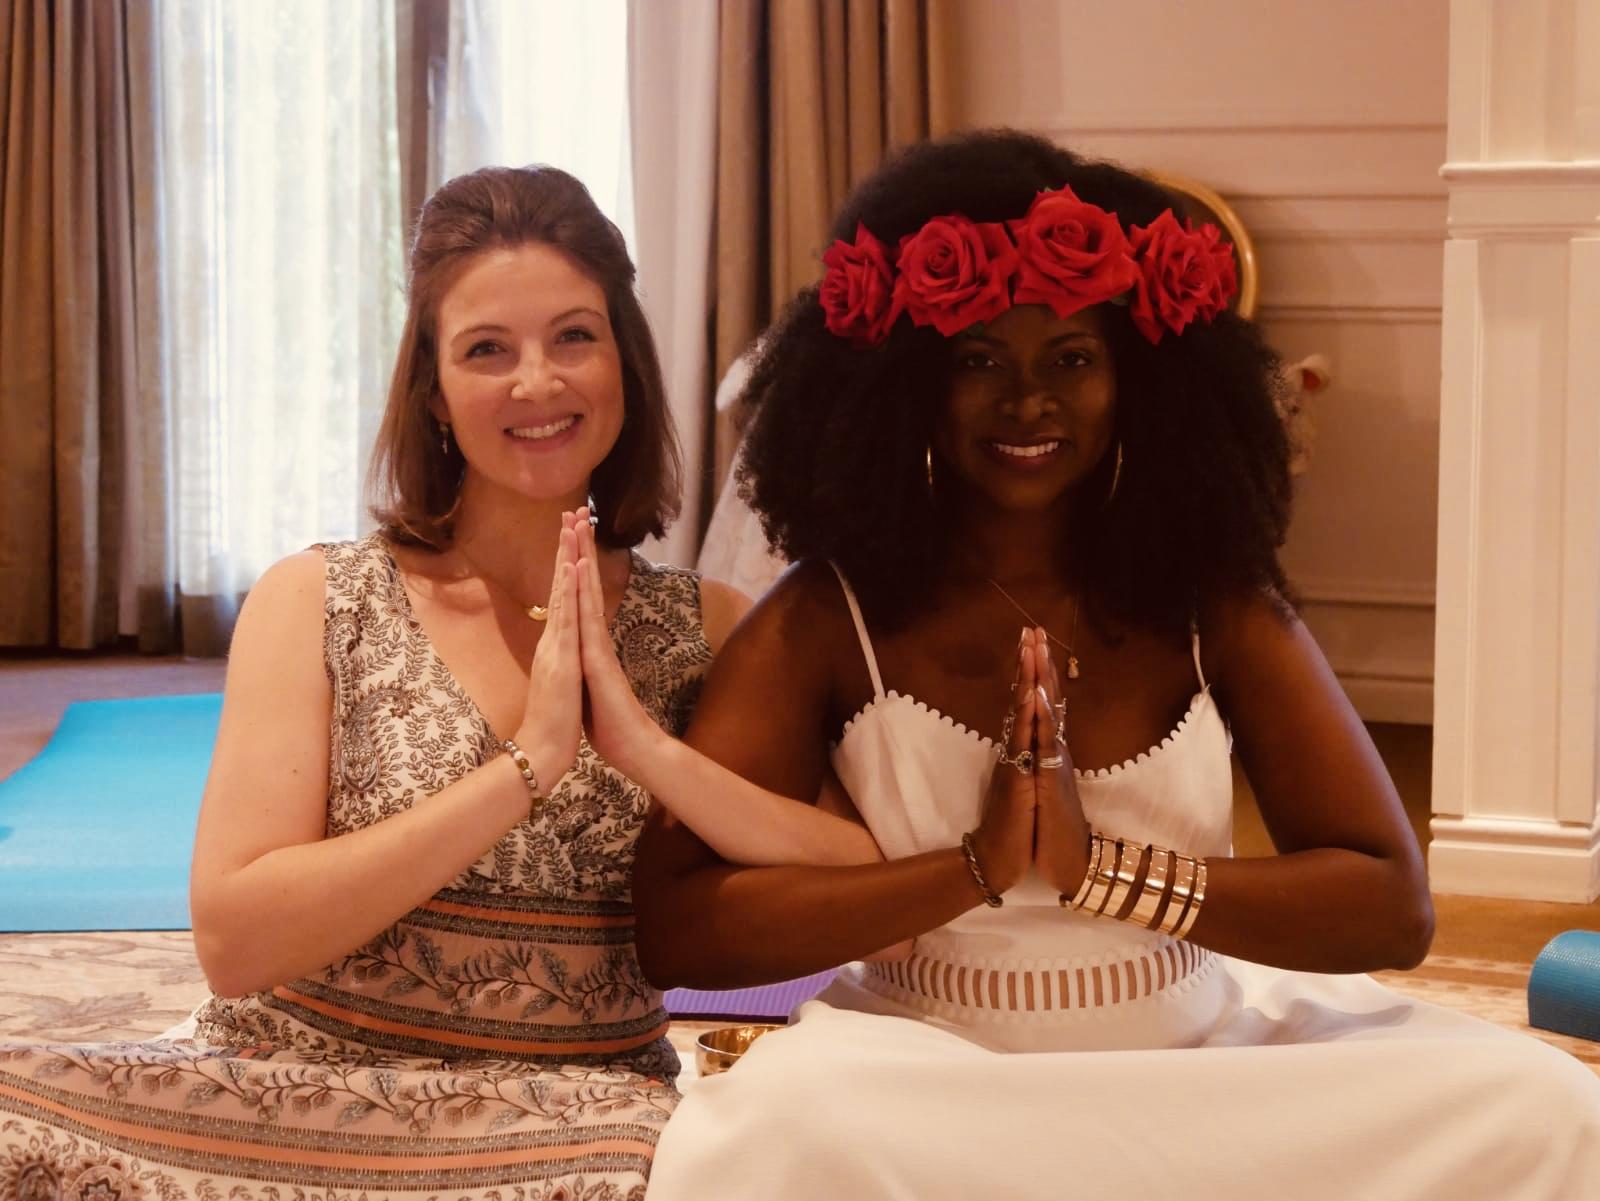 Meditation - Doris and Abiola in Chantilly France Goddess Retreat